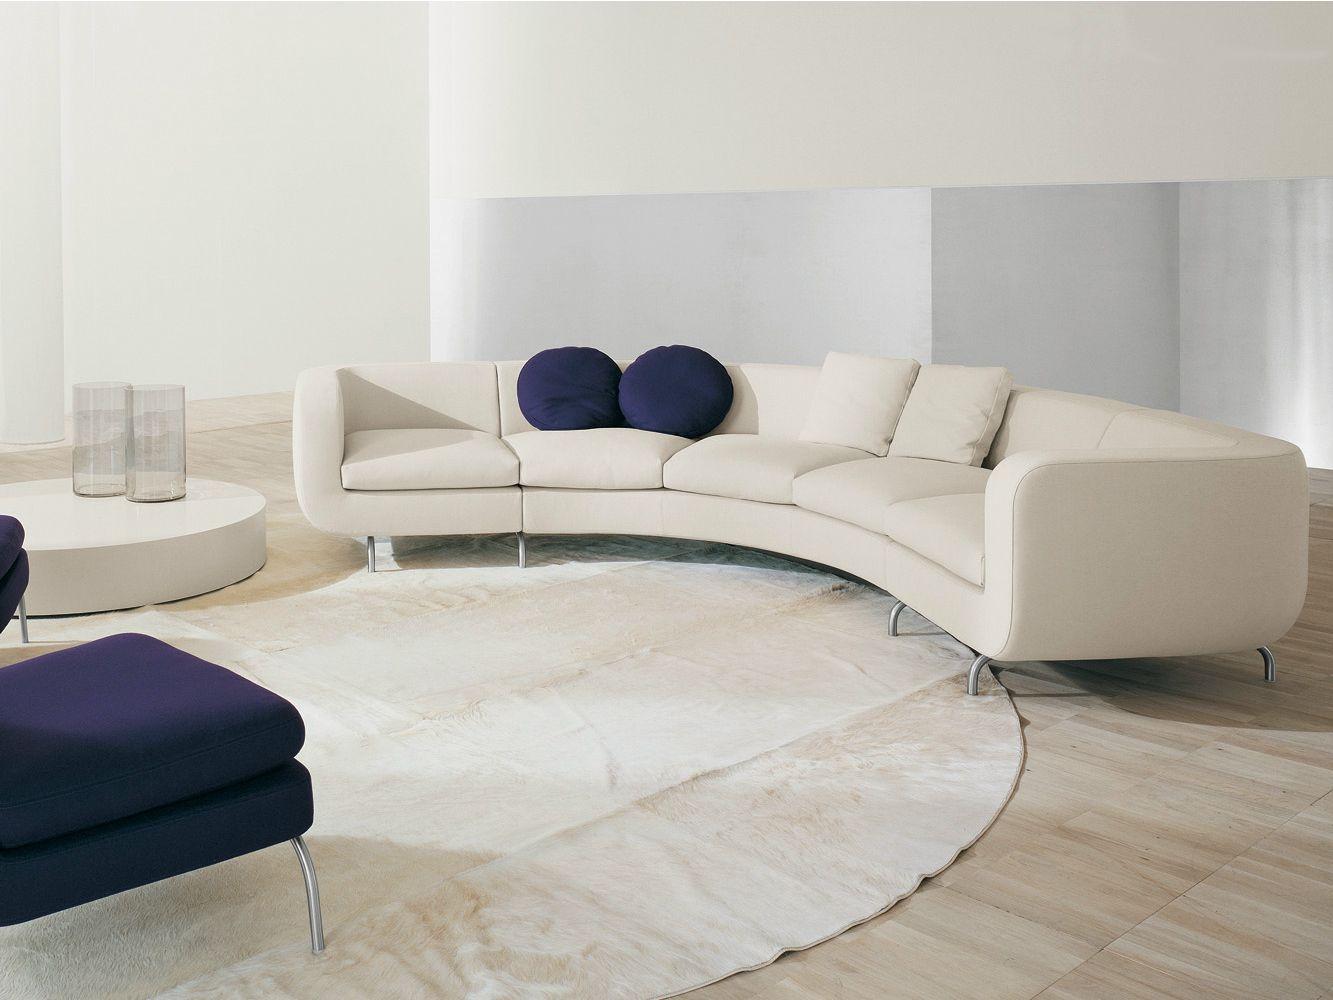 canape arrondi. Black Bedroom Furniture Sets. Home Design Ideas